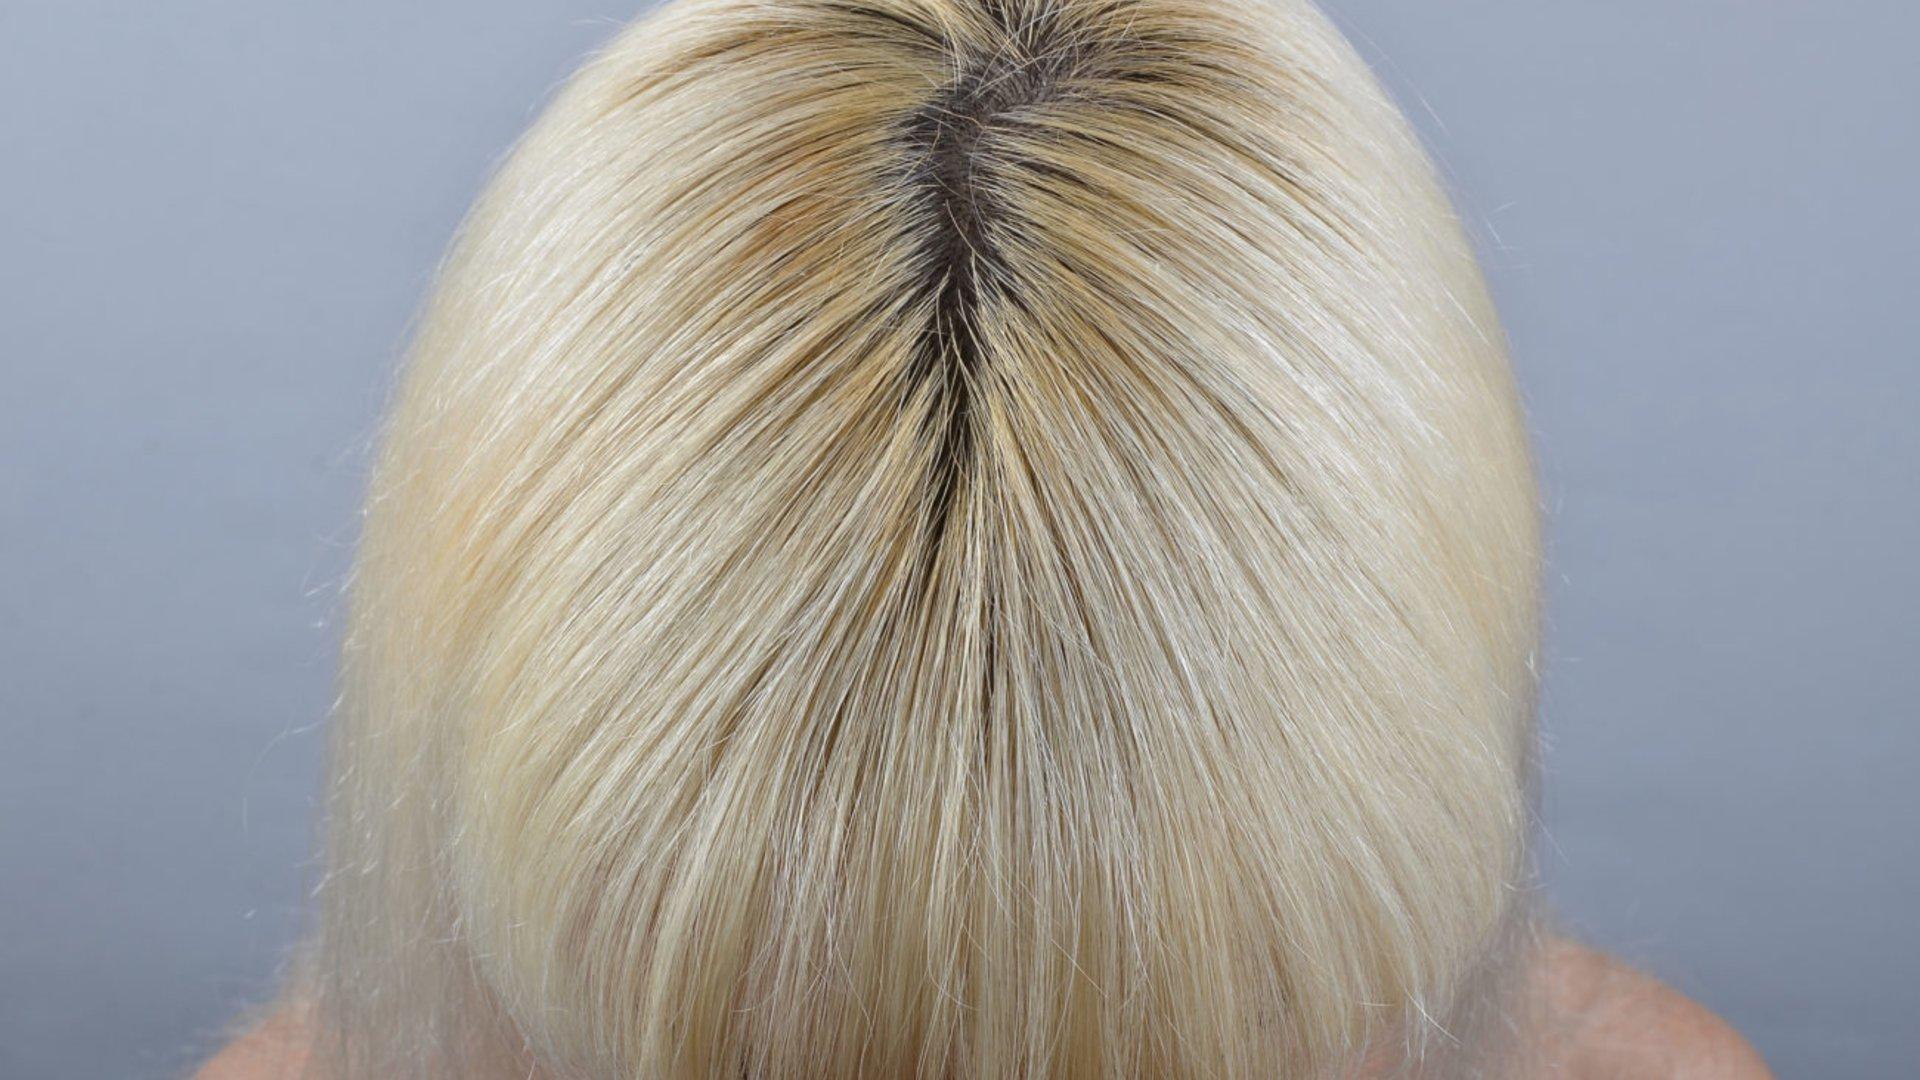 Graue haare strähnchen selber machen